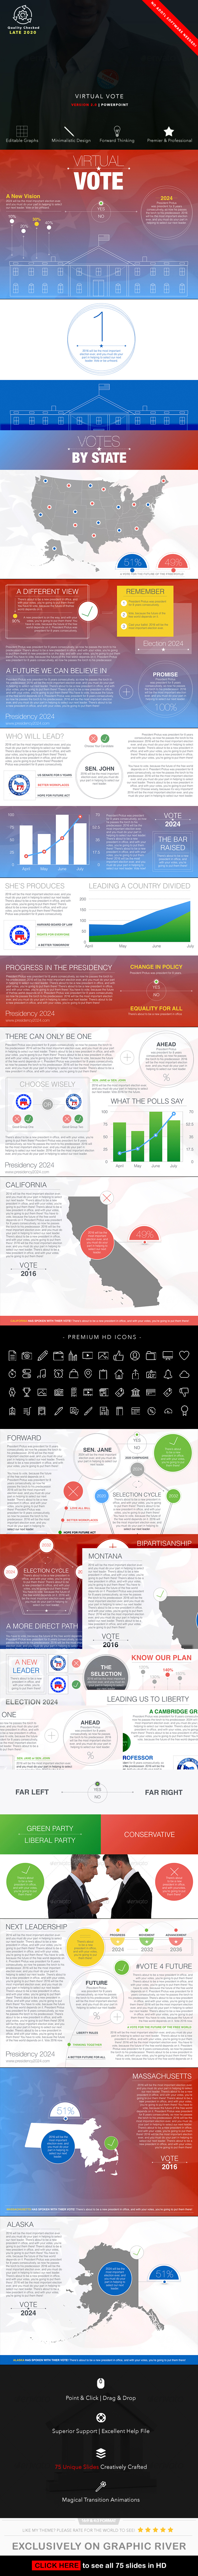 Virtual Vote PowerPoint Presentation